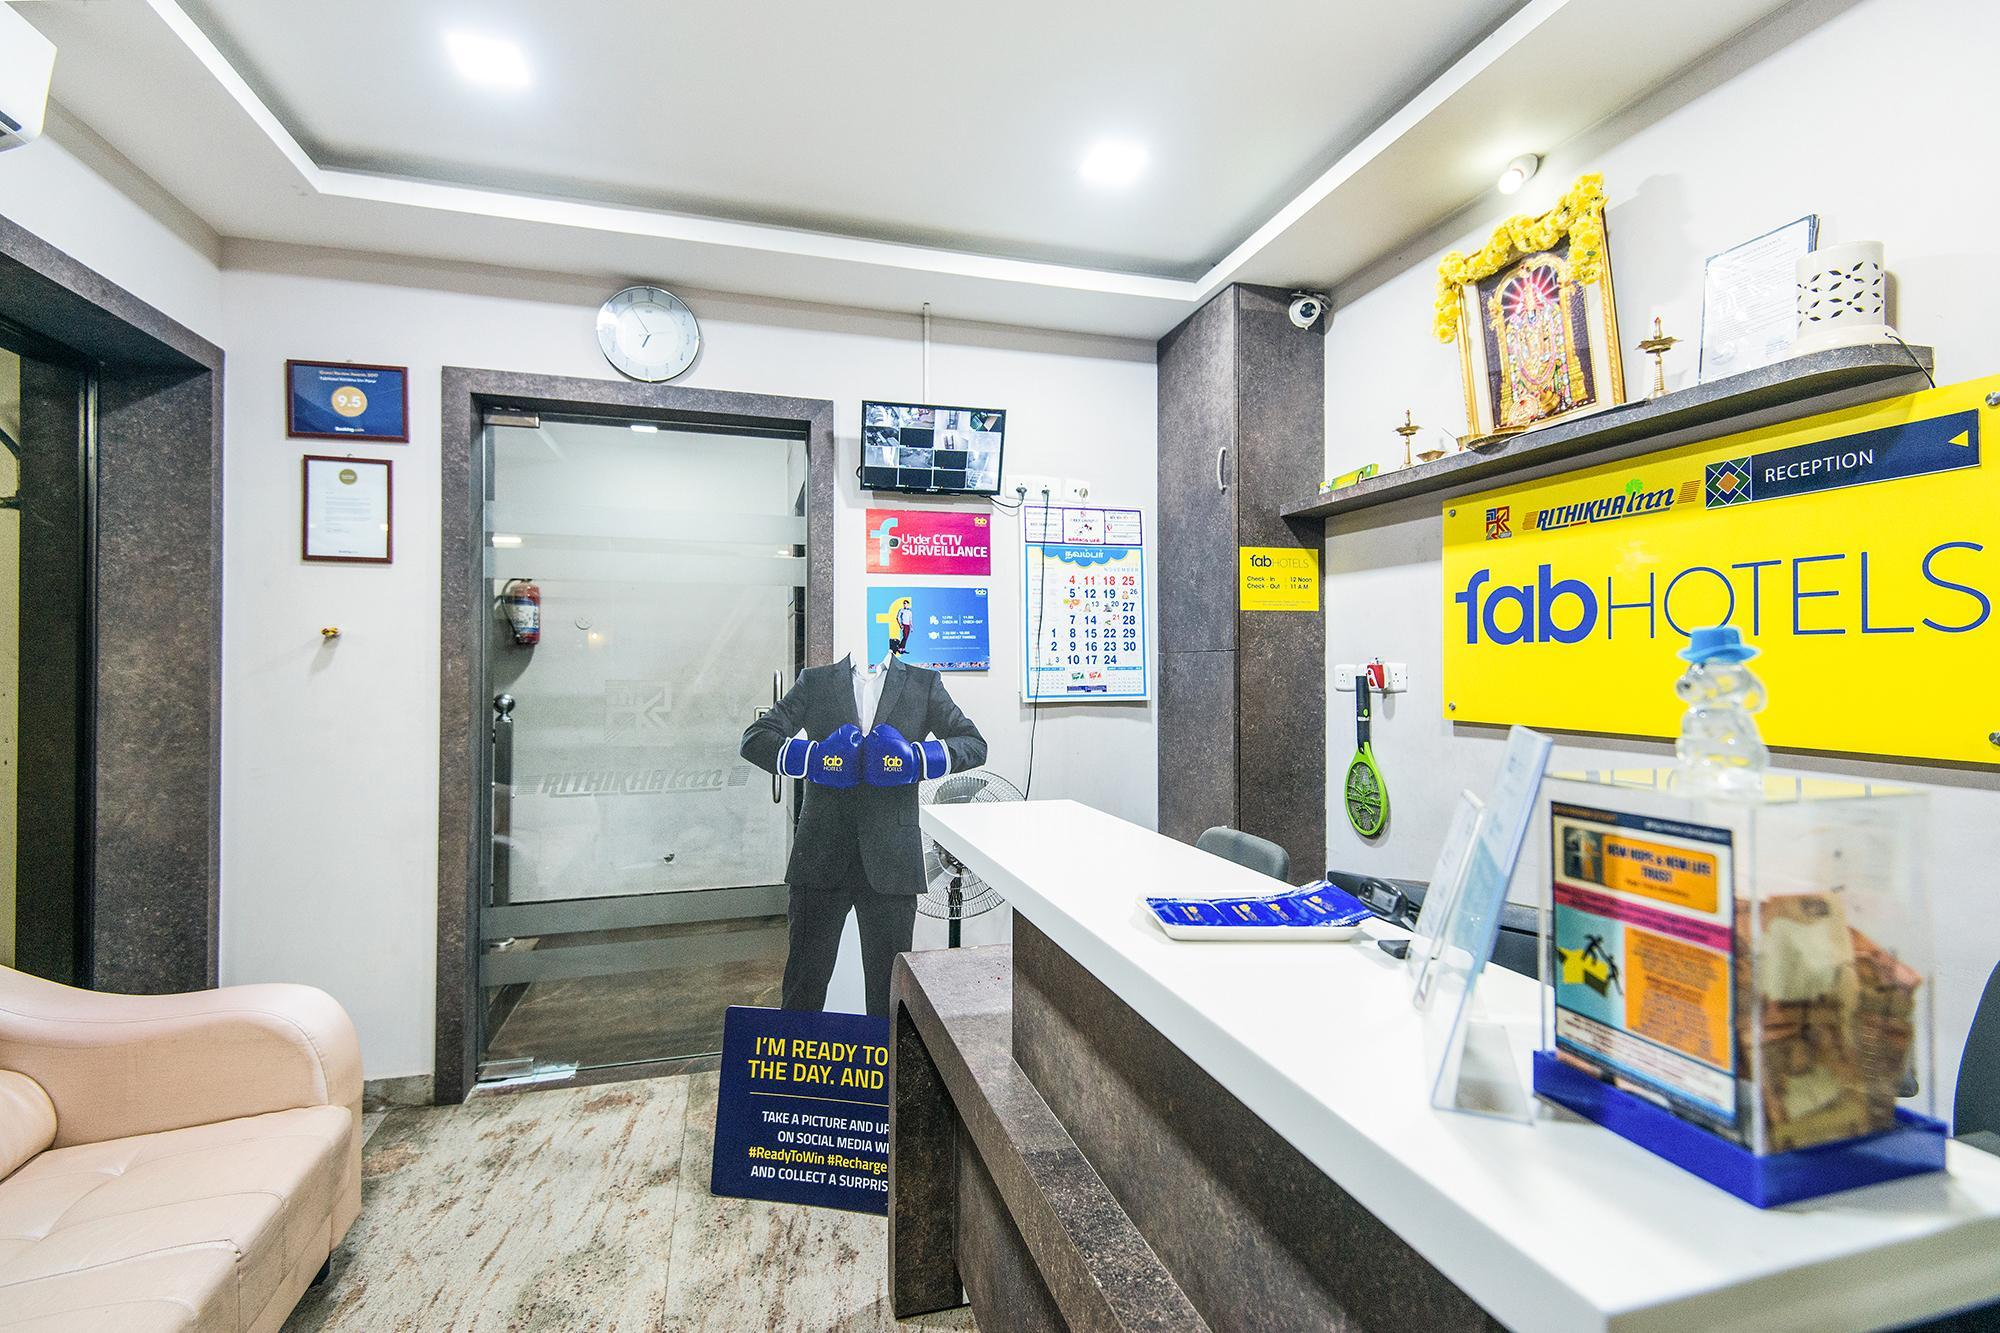 Fabhotel Rithika Inn Porur